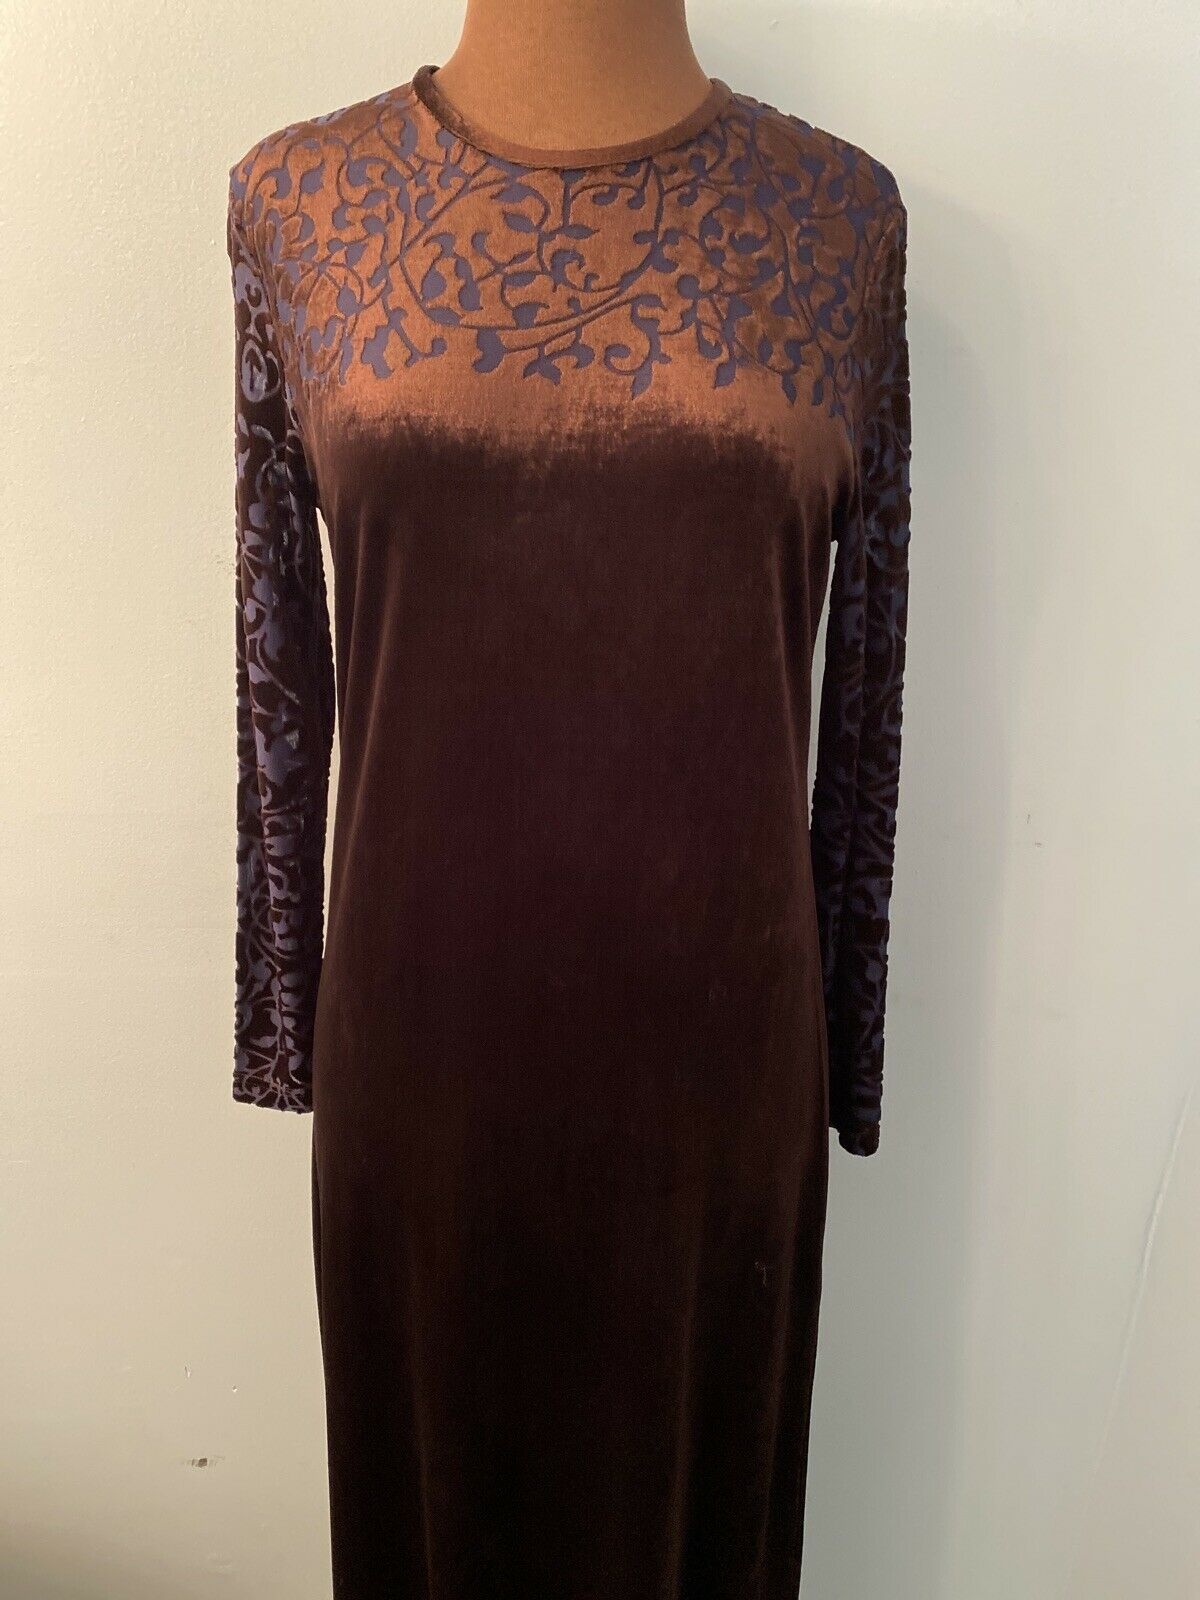 LIZ CLAIBORNE Women Sz M Brown Velvet Formal Sheer Blue CutOut Sleeves/Neck EUC